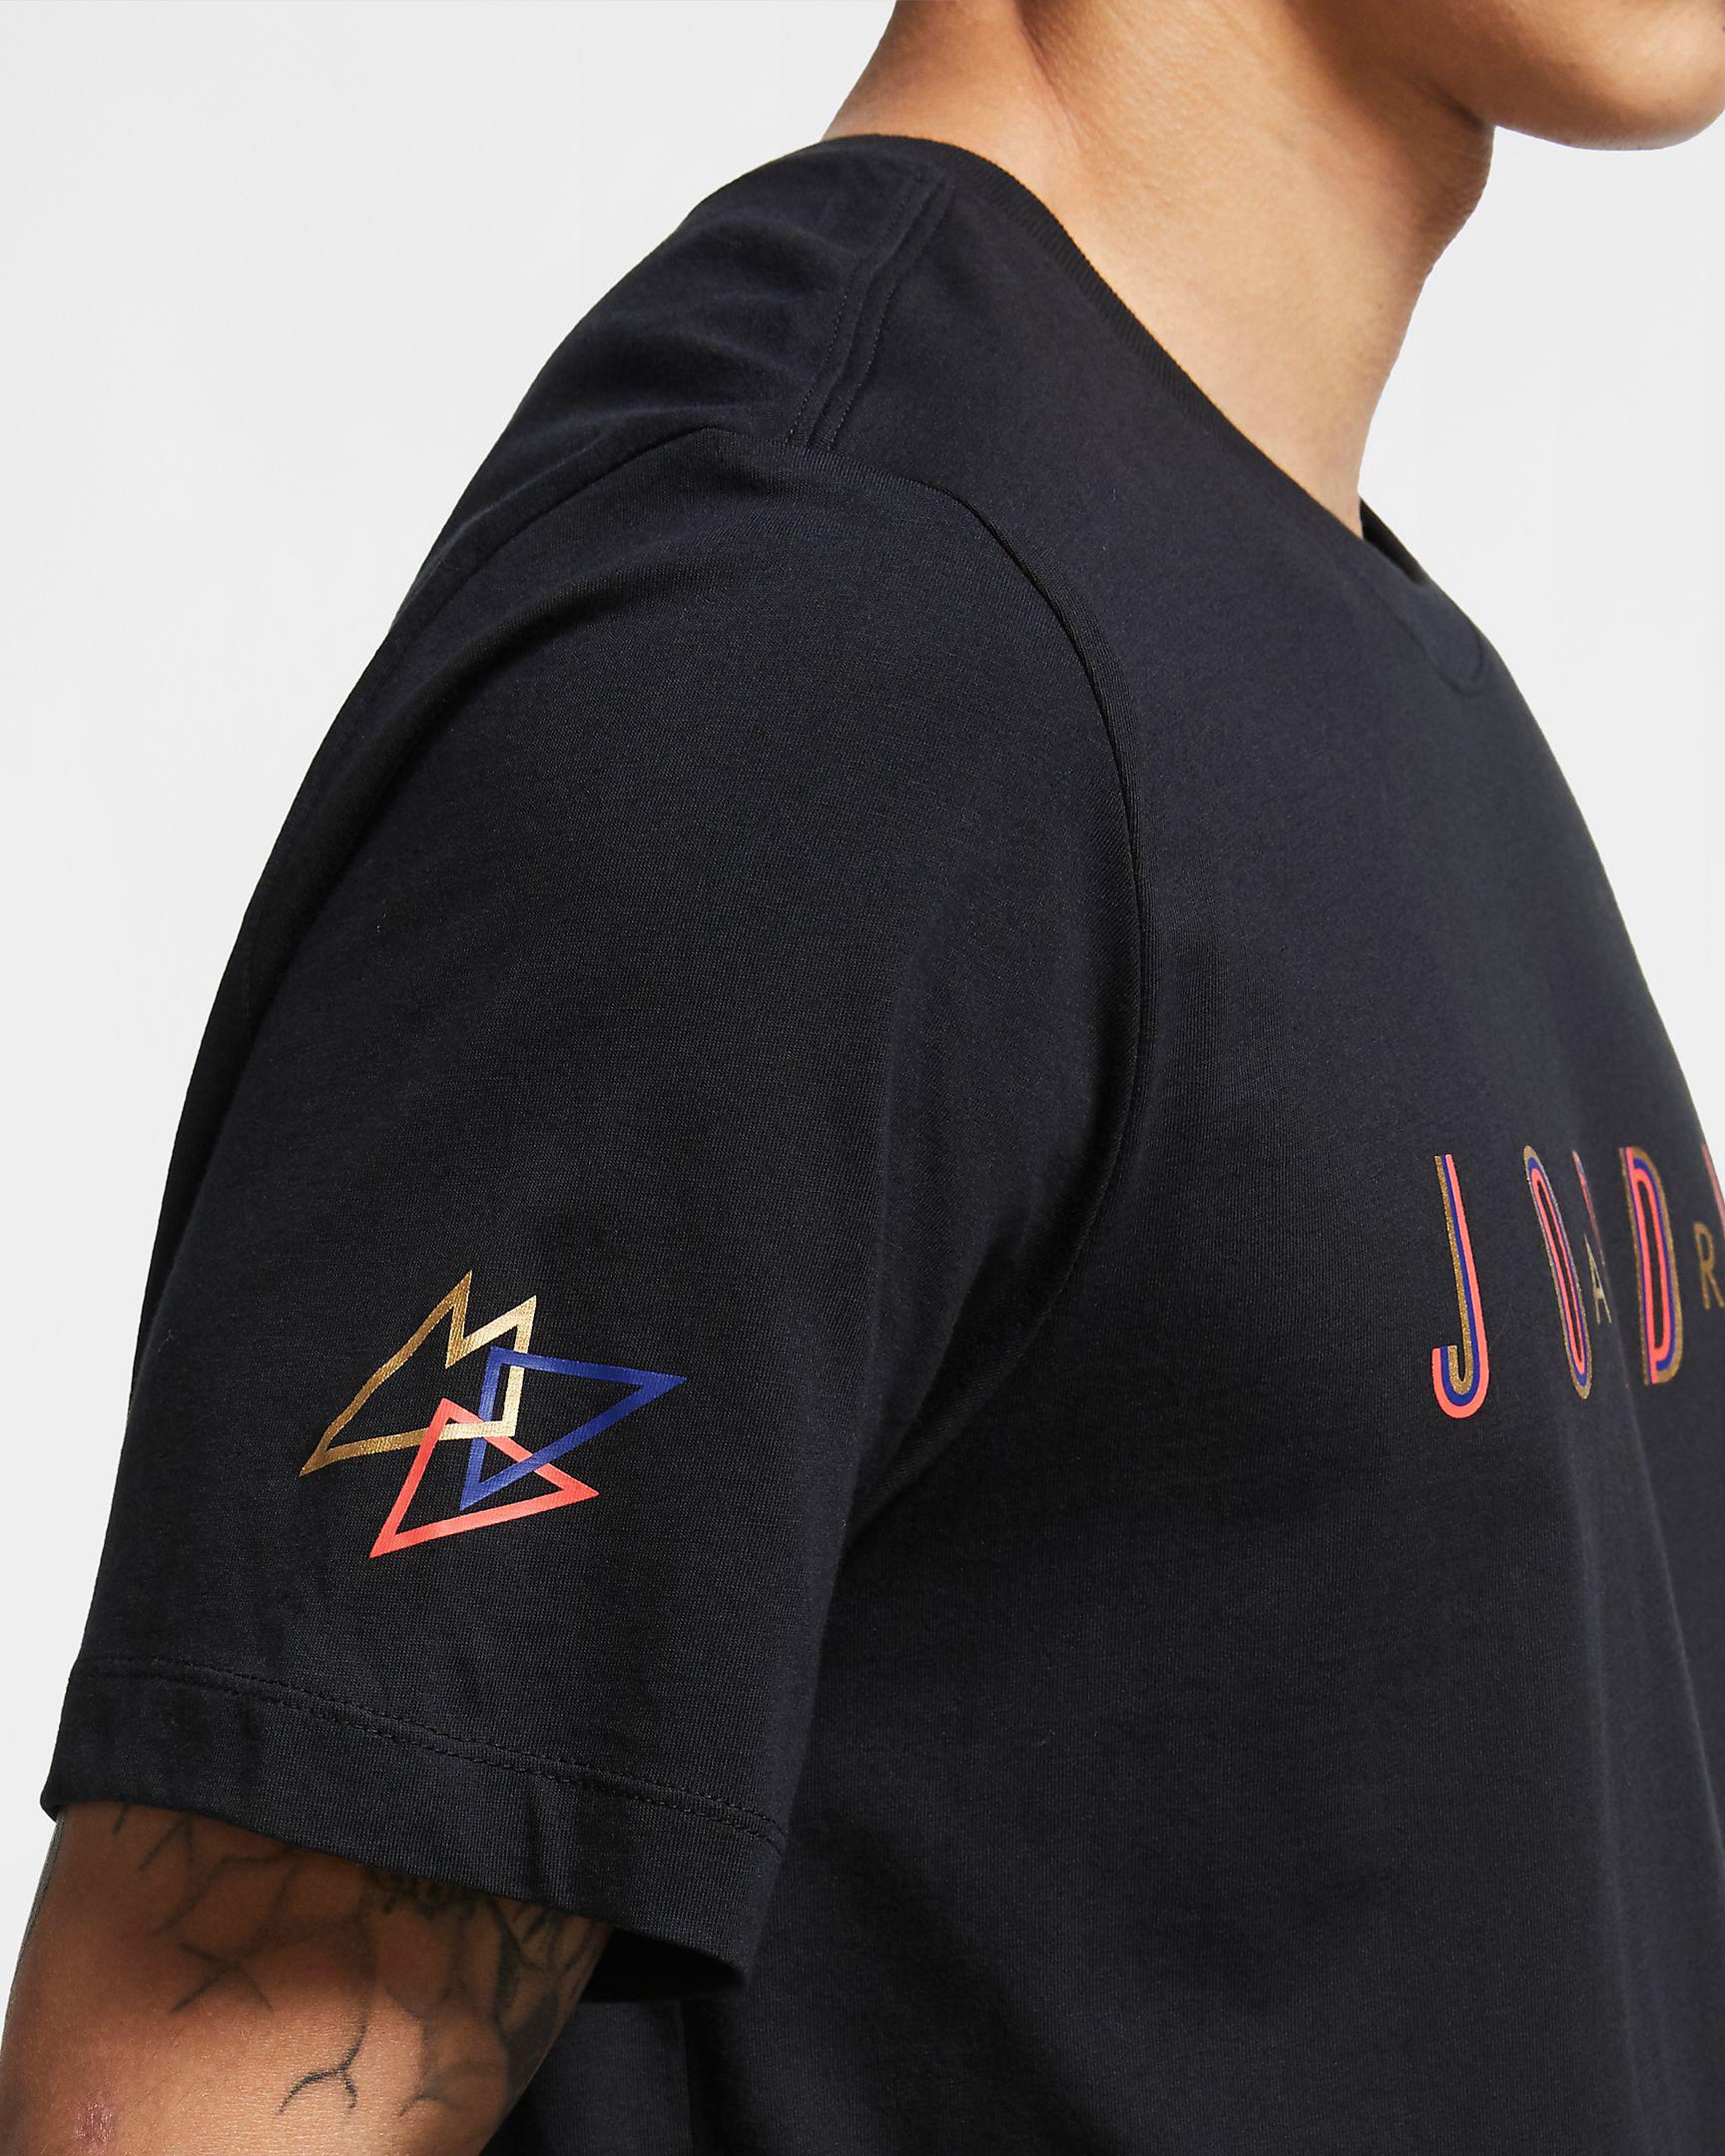 air-jordan-1-low-sweater-nothing-but-net-shirt-match-3